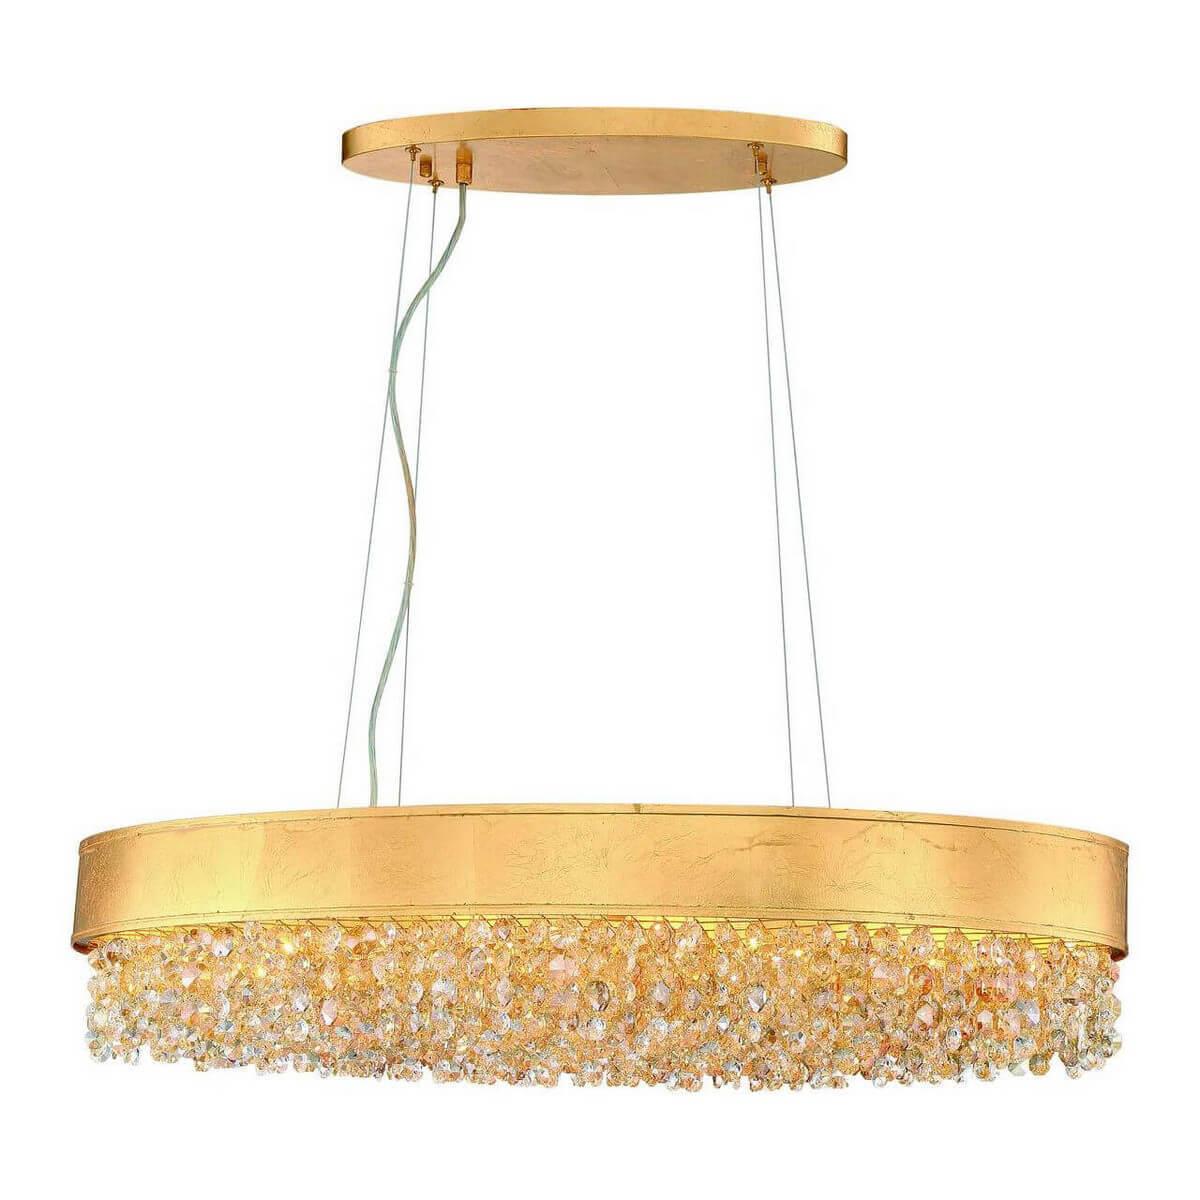 Подвесной светильник Lucia Tucci Fabian 1555.8 Gold Leaf abt tobias erath fabian power of e motion